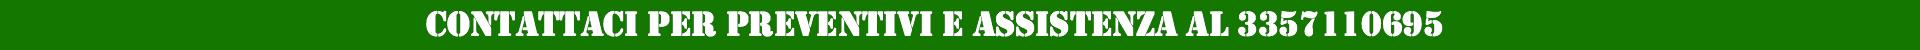 banner_fartecnica_7